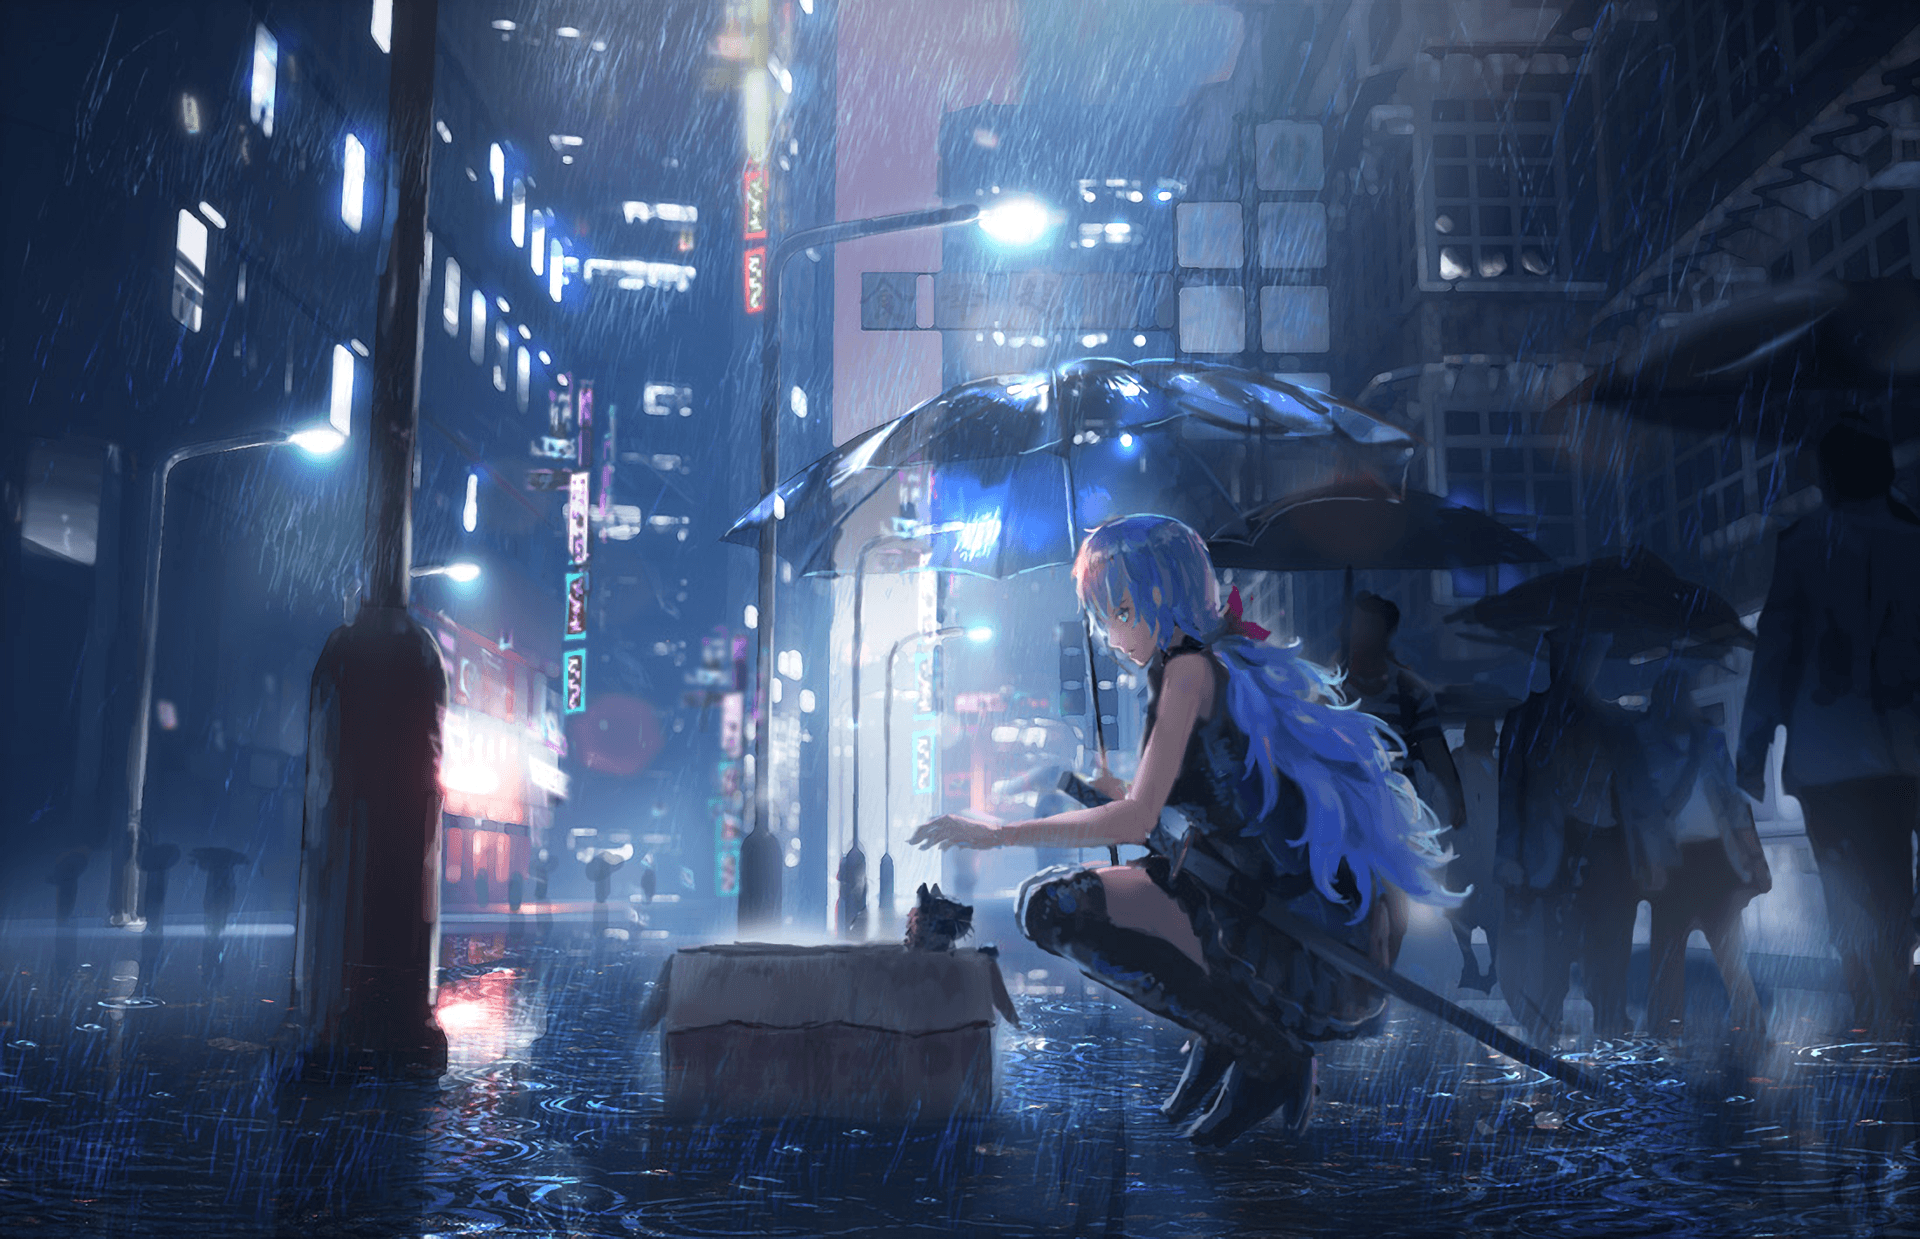 Anime Rain Girl Umbrella Wallpapers - Wallpaper Cave